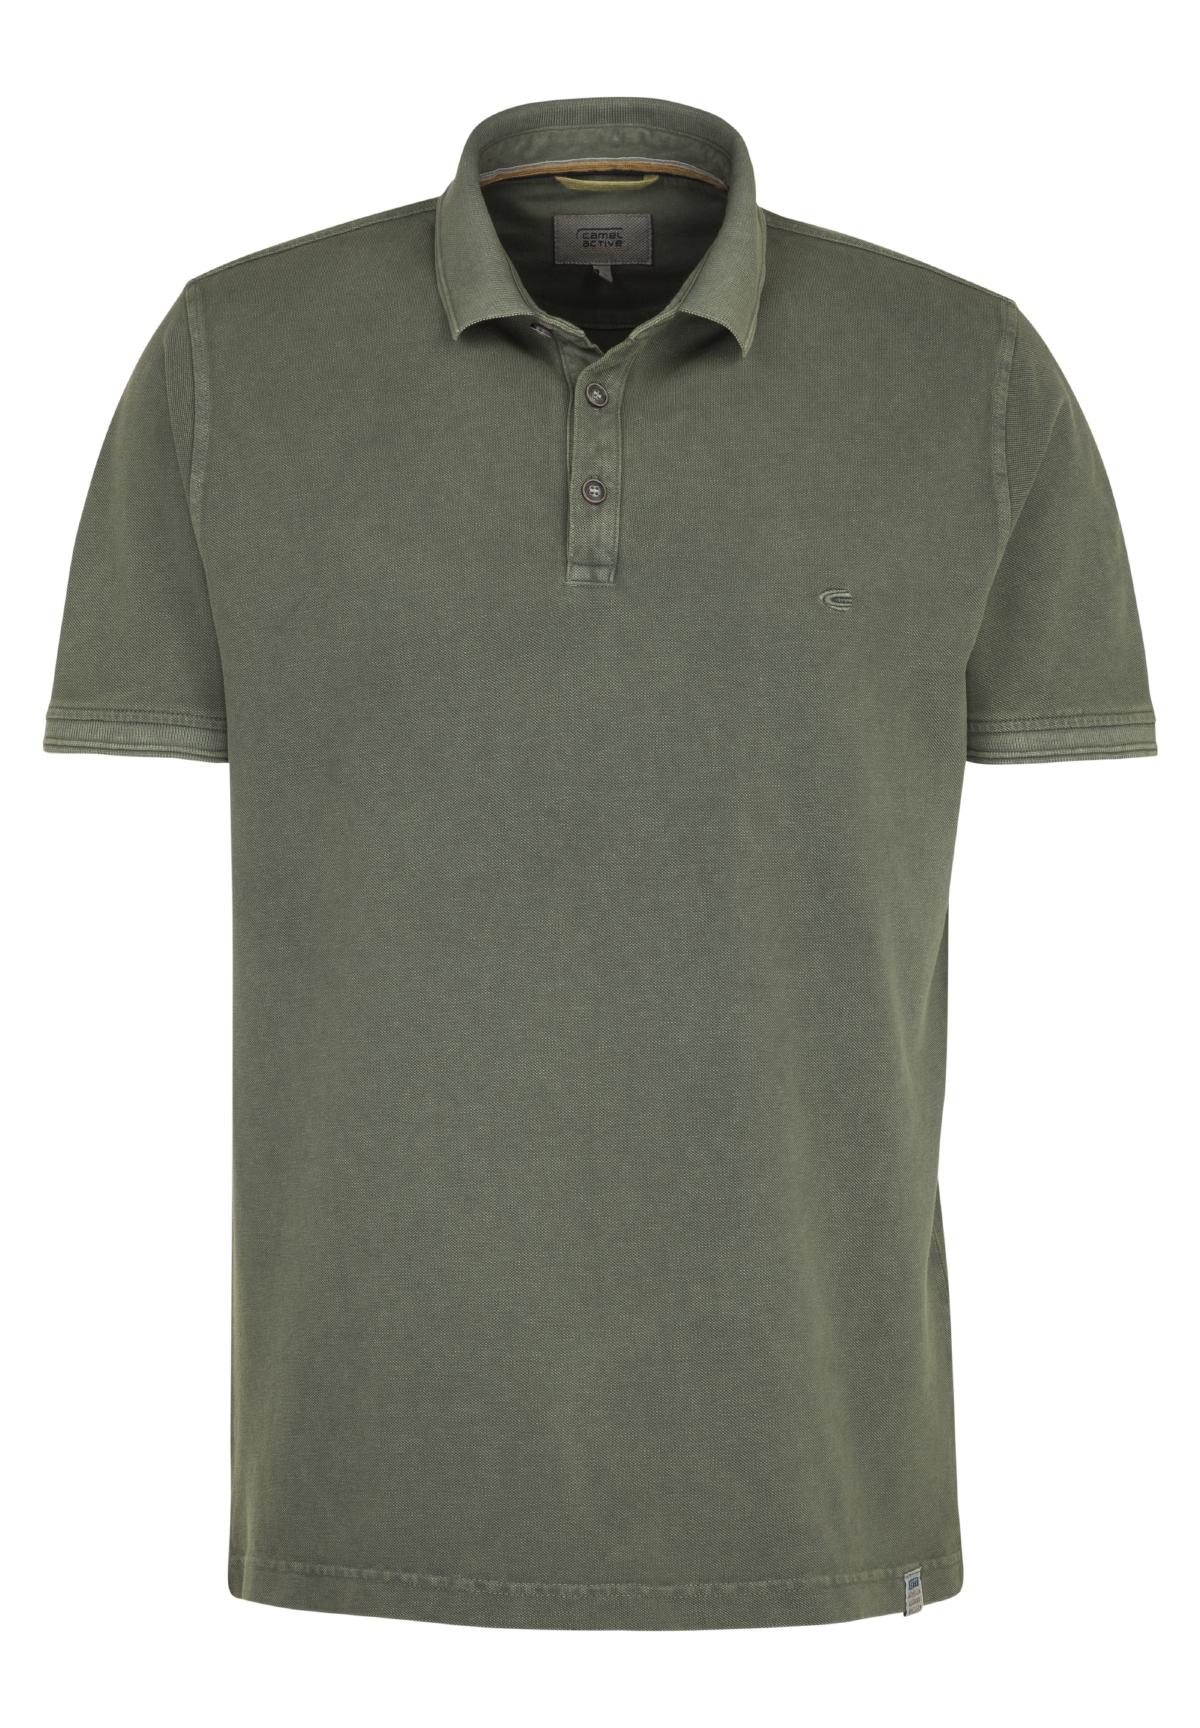 Camel-Active-Herren-Shirt-Poloshirt-Pique-Regular-Fit-NEU Indexbild 77